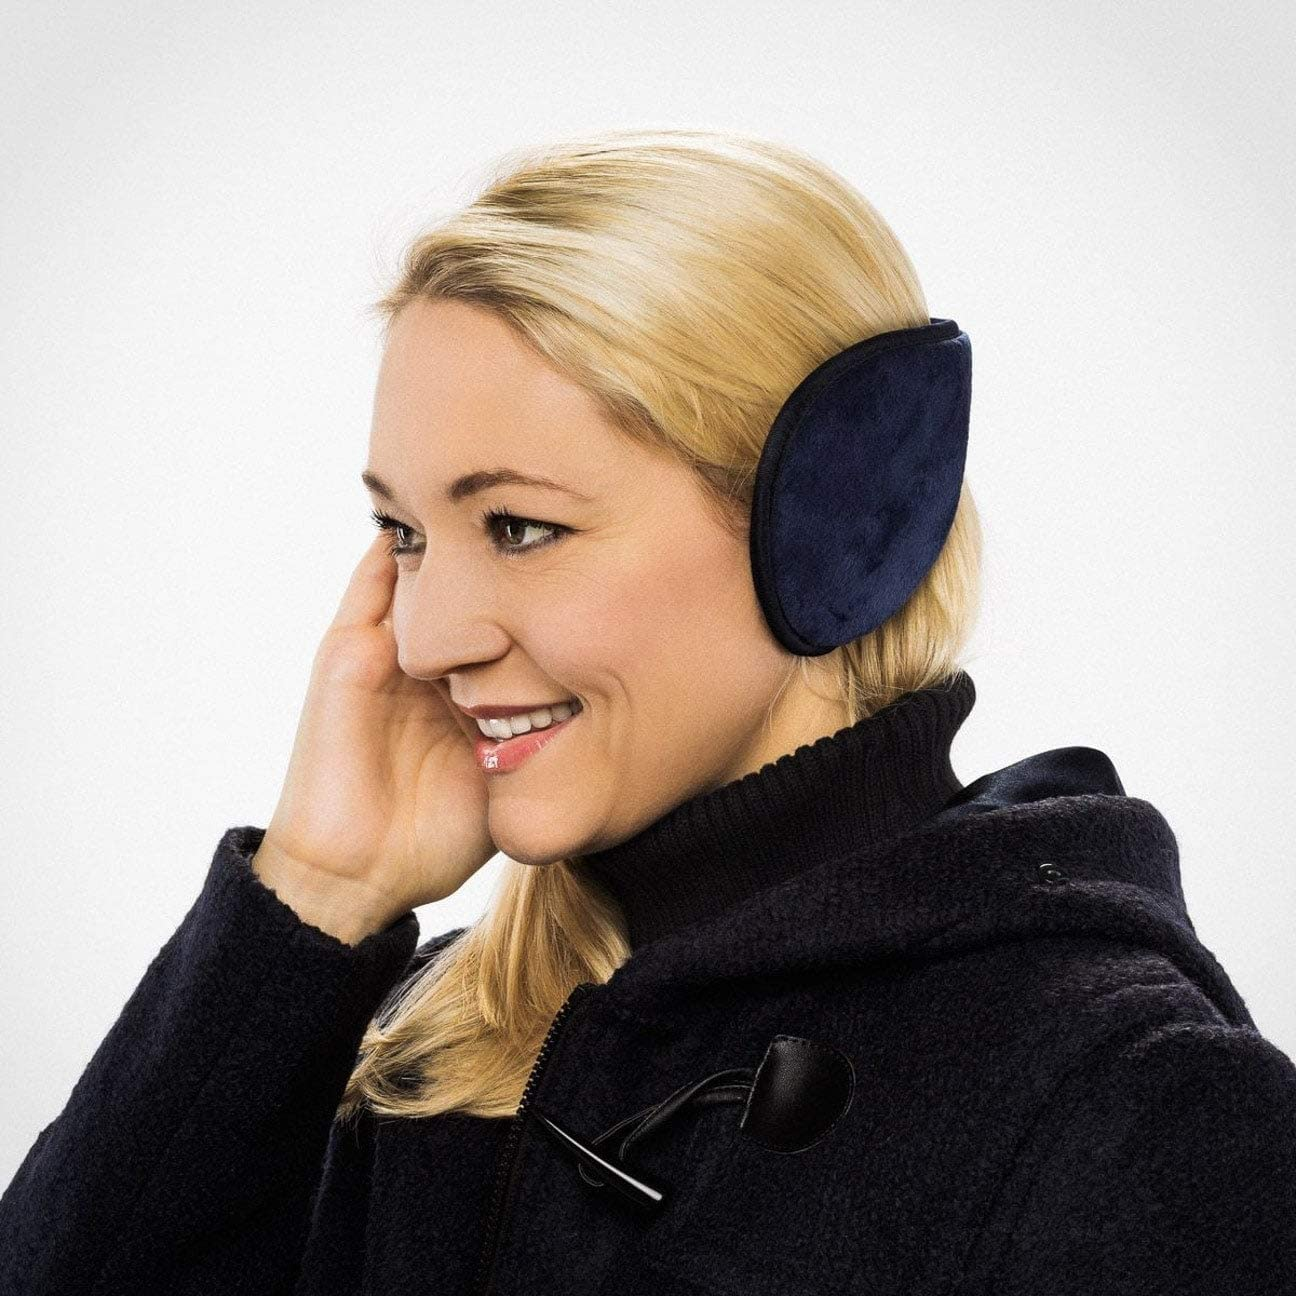 ohrenw/ärmend Ohrenband Herren Herbst-Winter McBurn Earband Basic Ohrenw/ärmer Damen//Herren